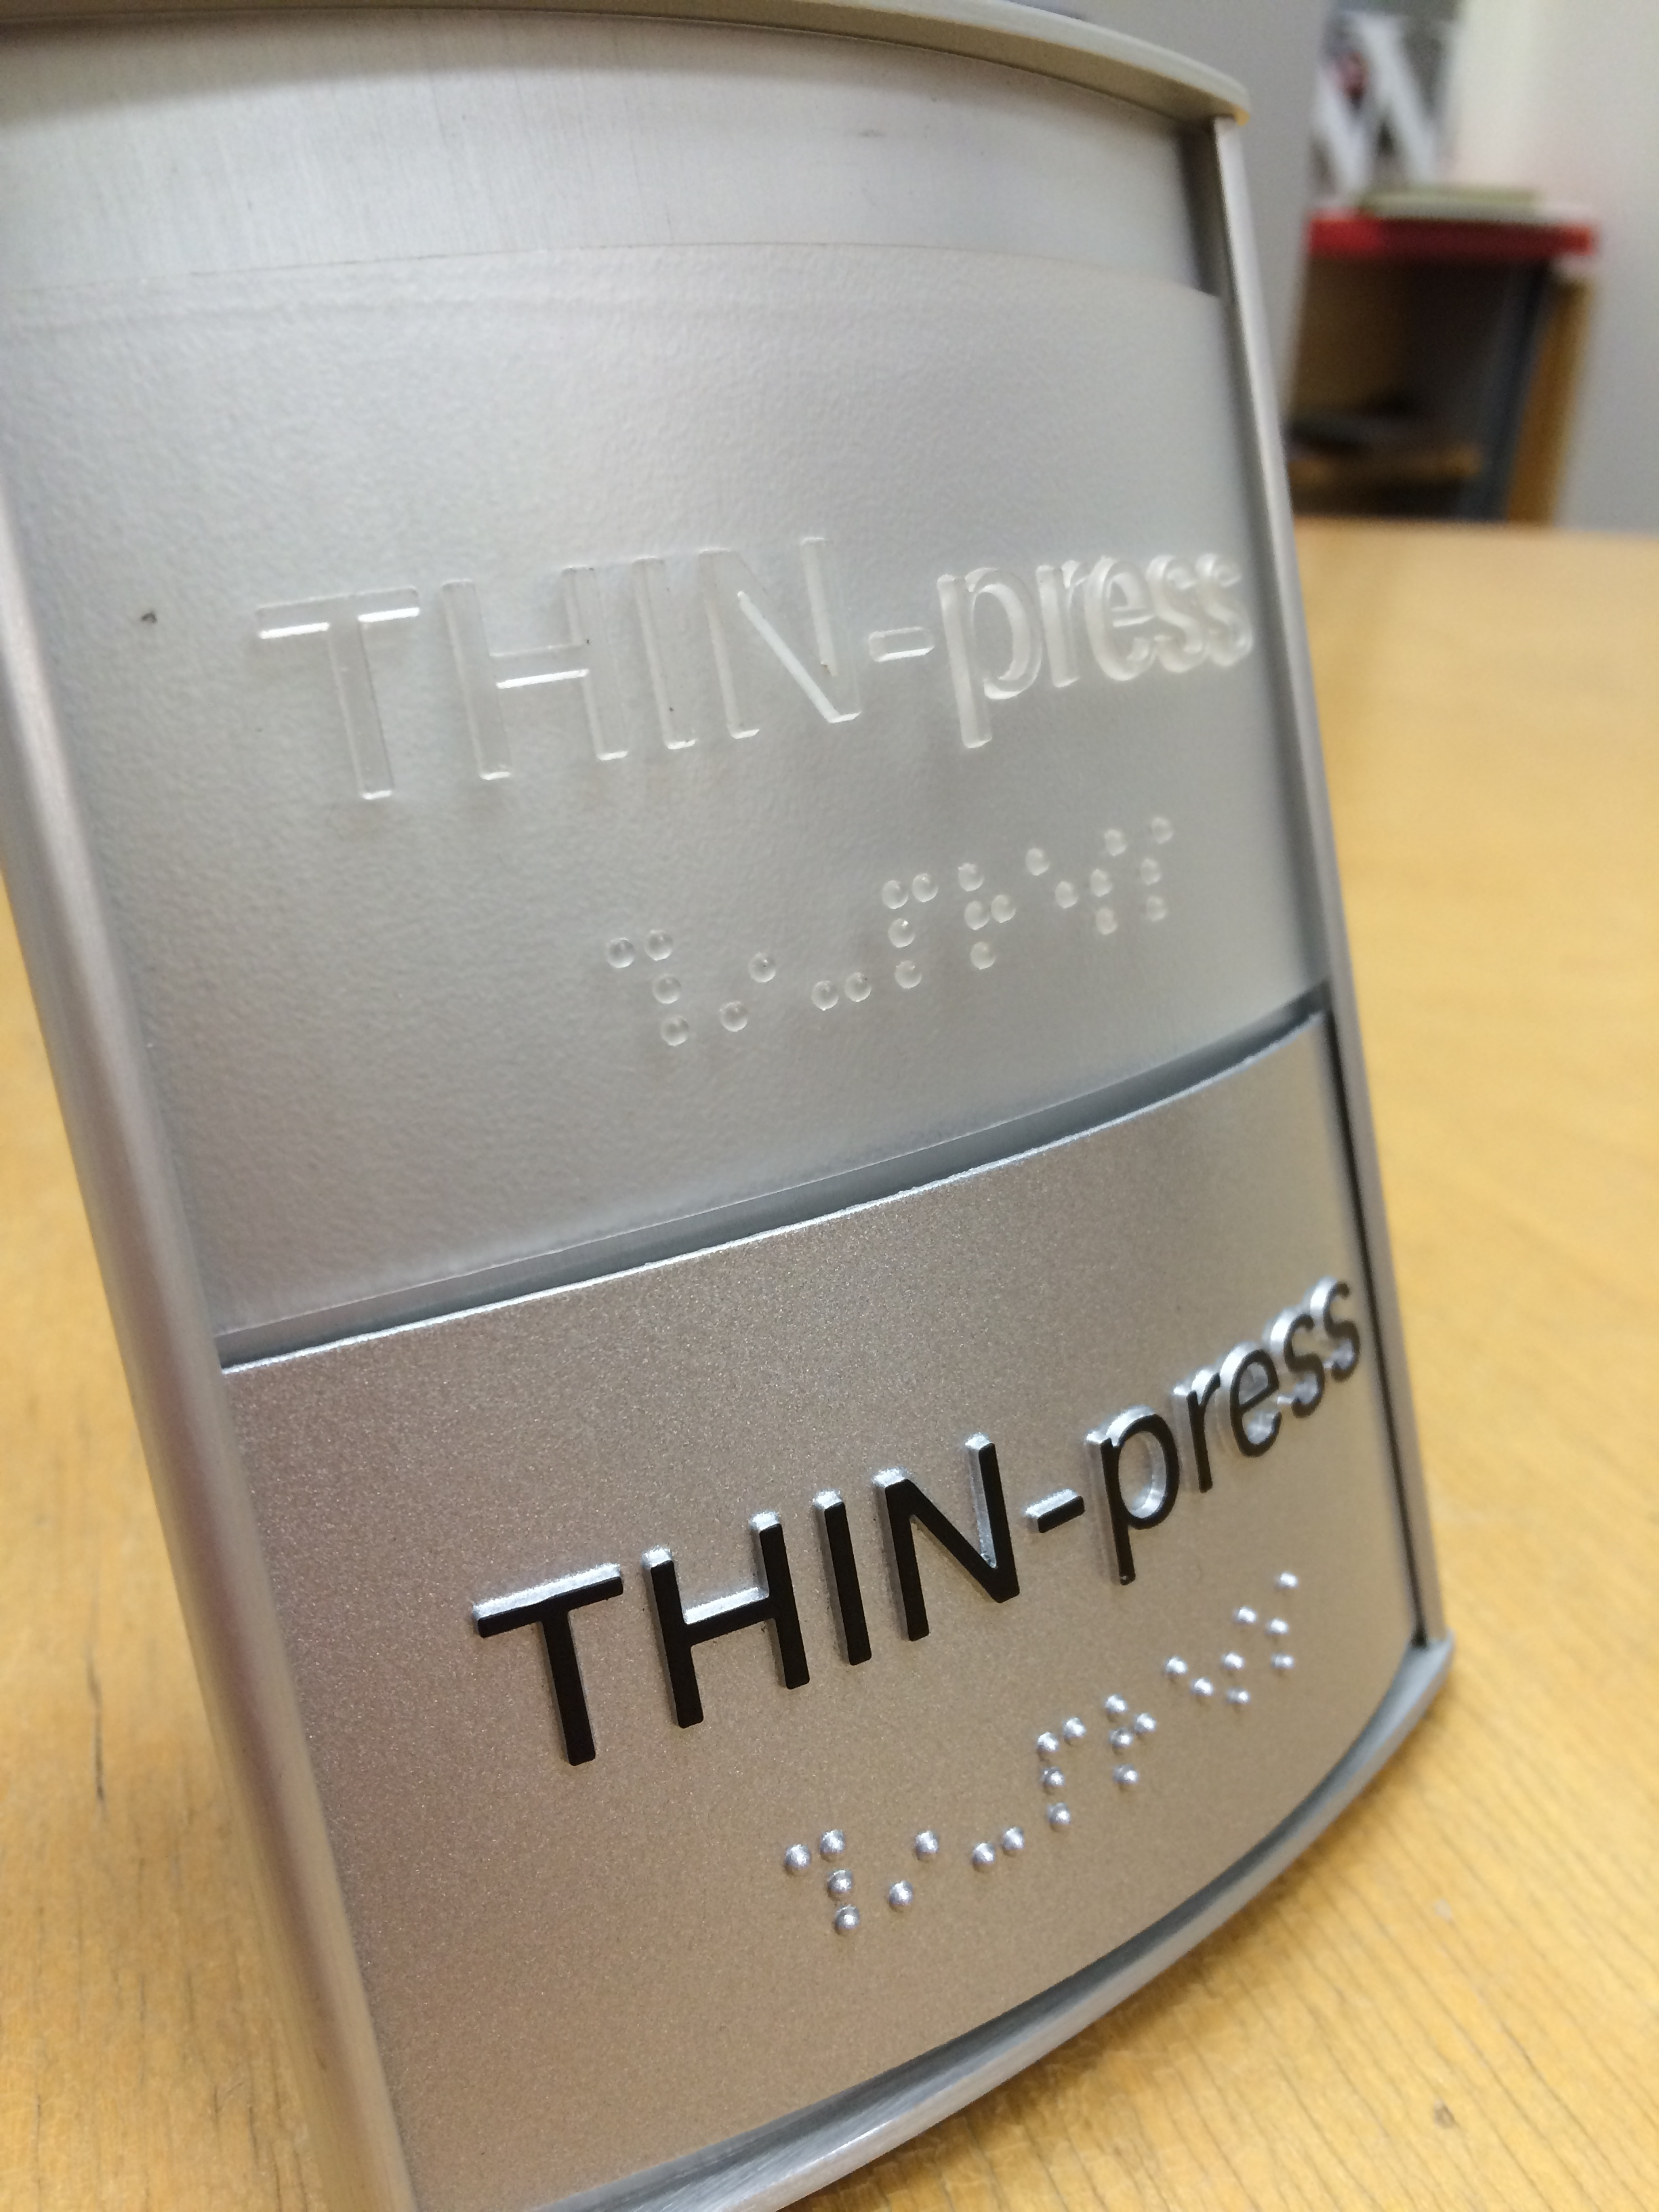 THIN-press Encompass Sign.JPG